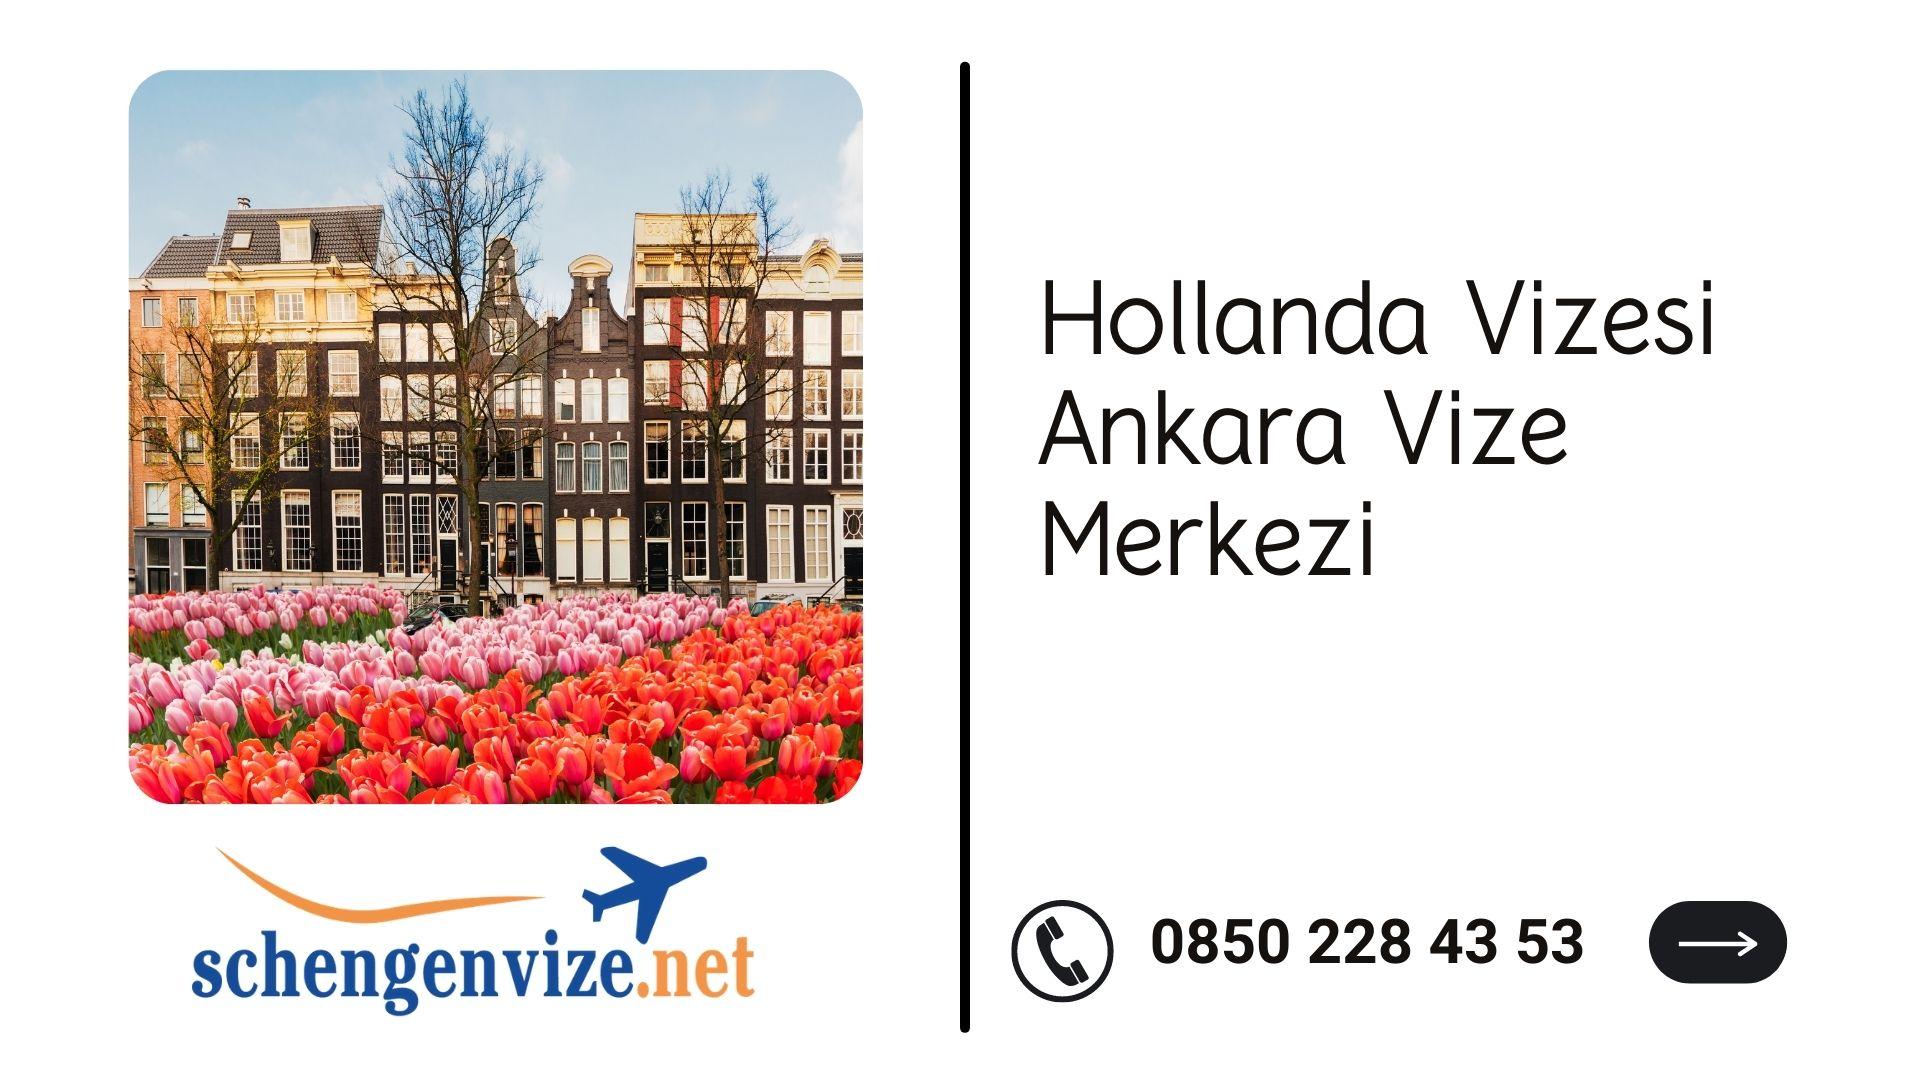 Hollanda Vizesi Ankara Vize Merkezi